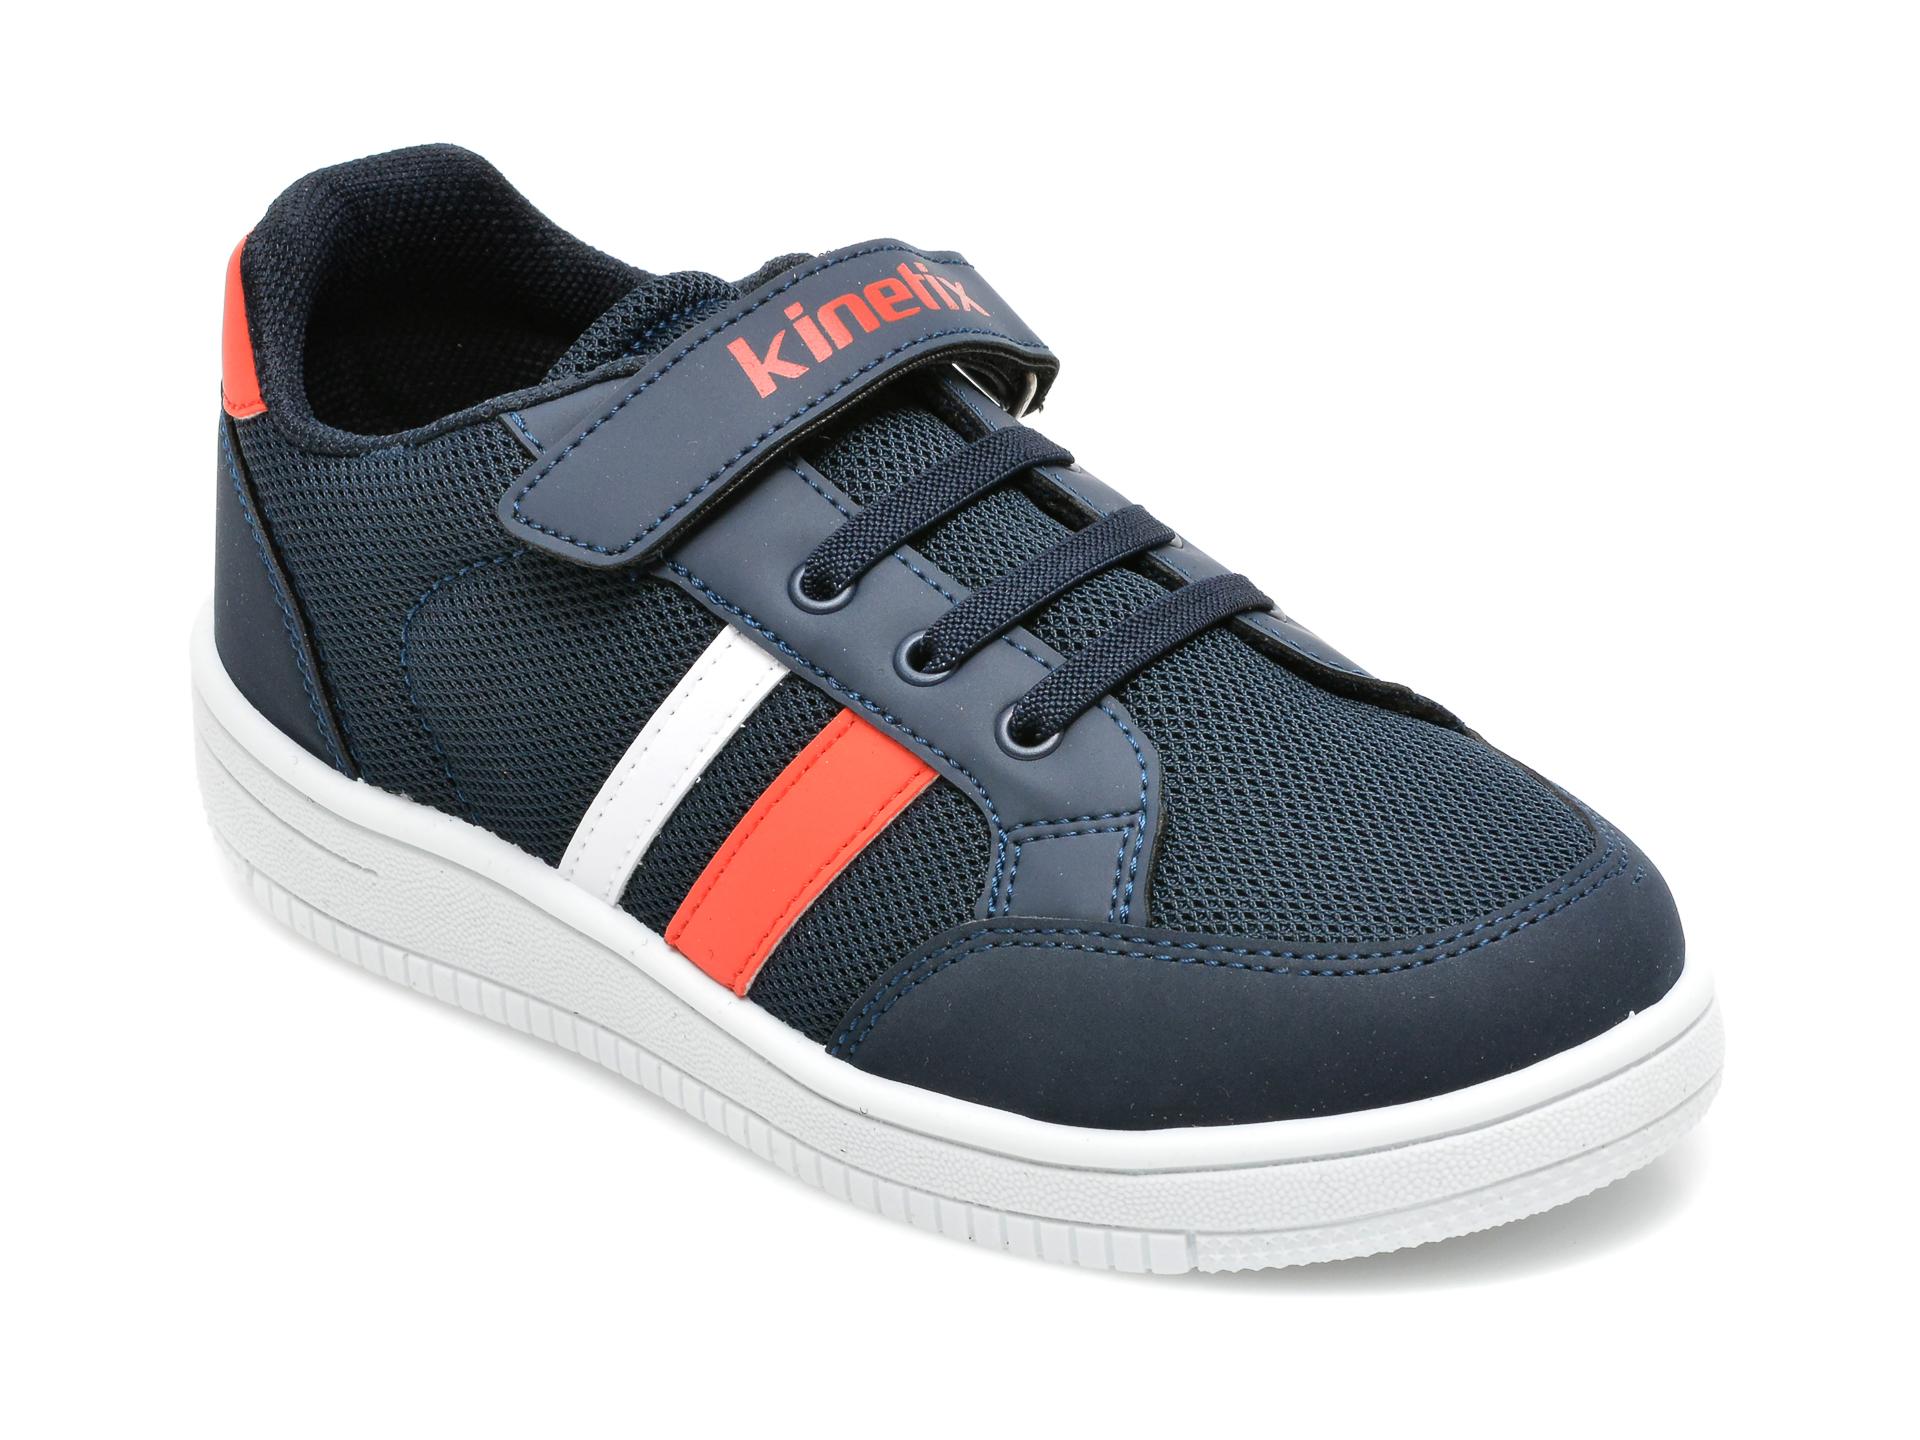 Pantofi sport KINETIX bleumarin, Malibu Mesh Boy 1Fx, din material textil